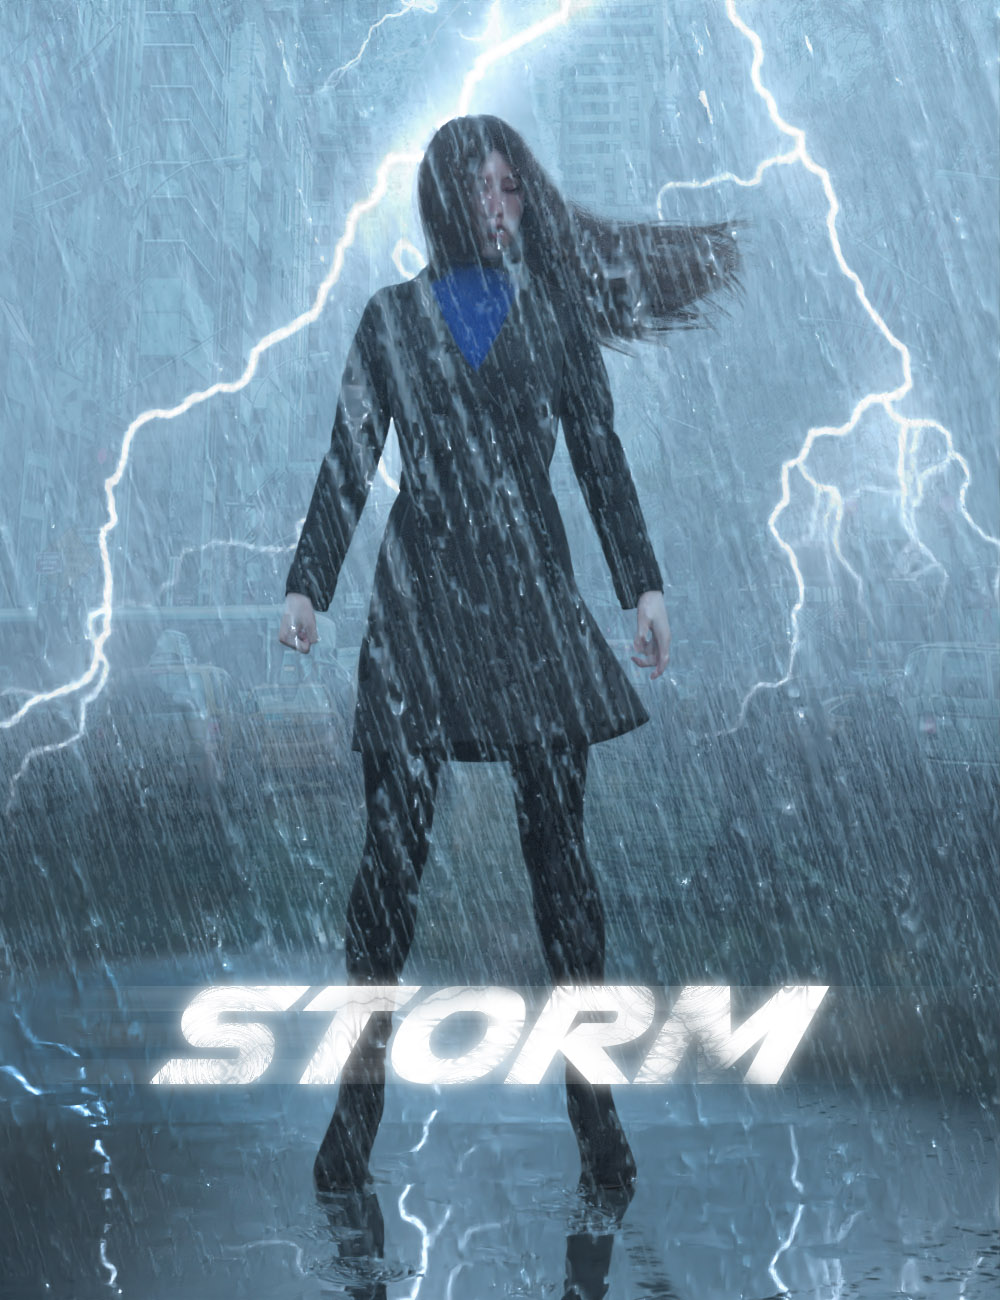 Iray Storm by: KindredArts, 3D Models by Daz 3D